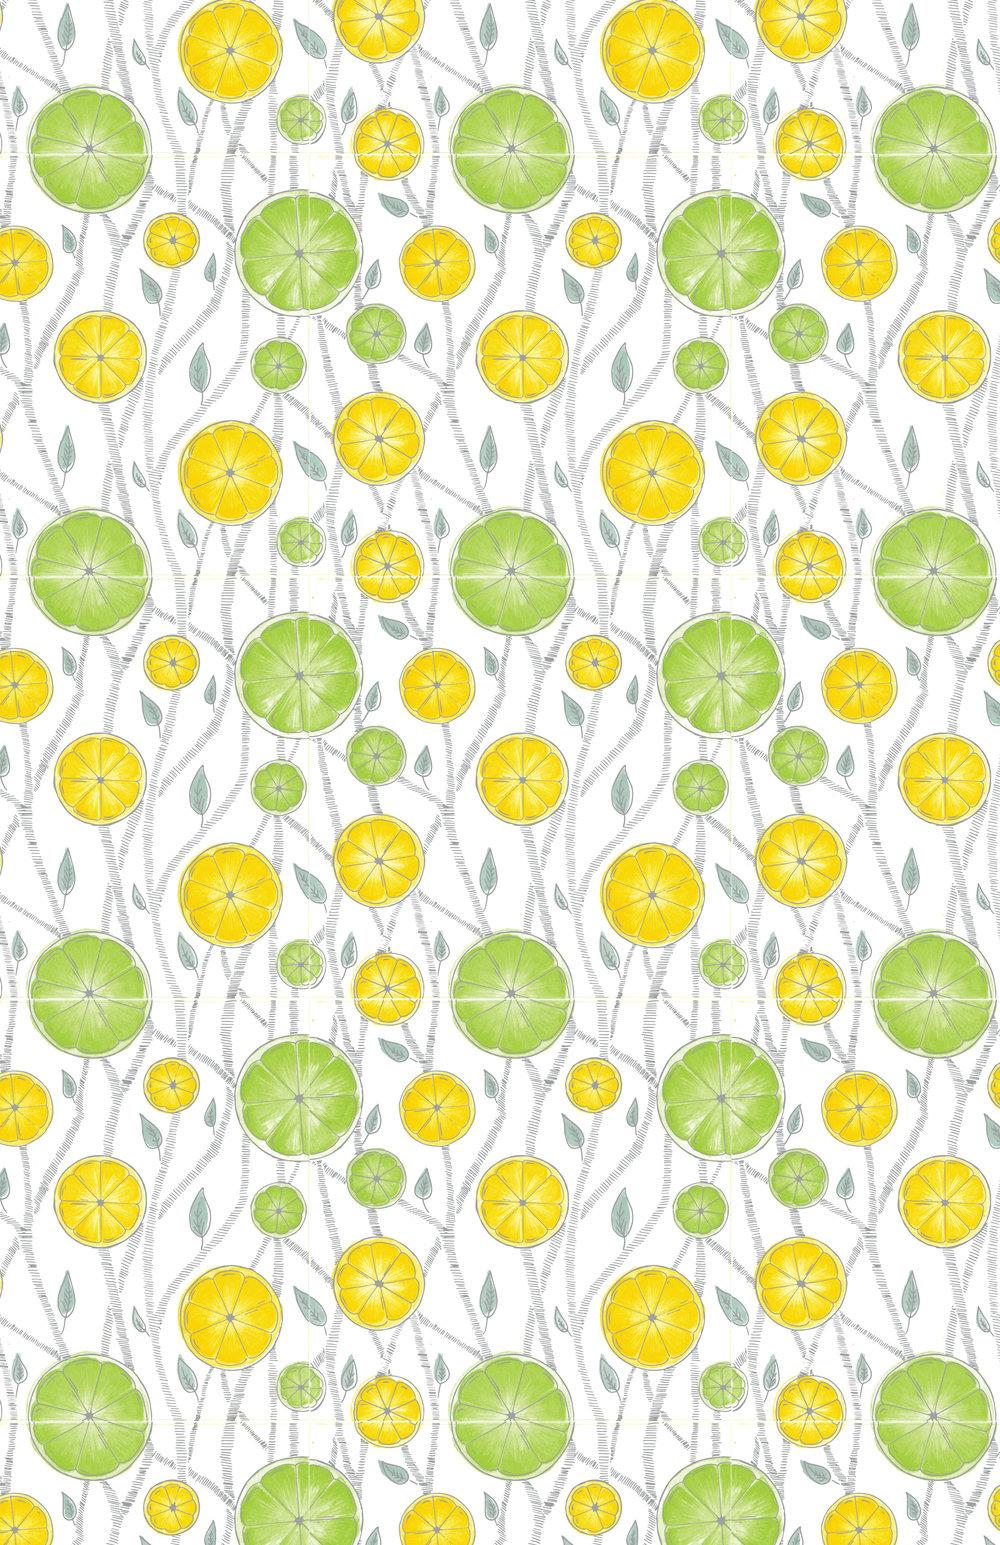 pattern2-04.jpg